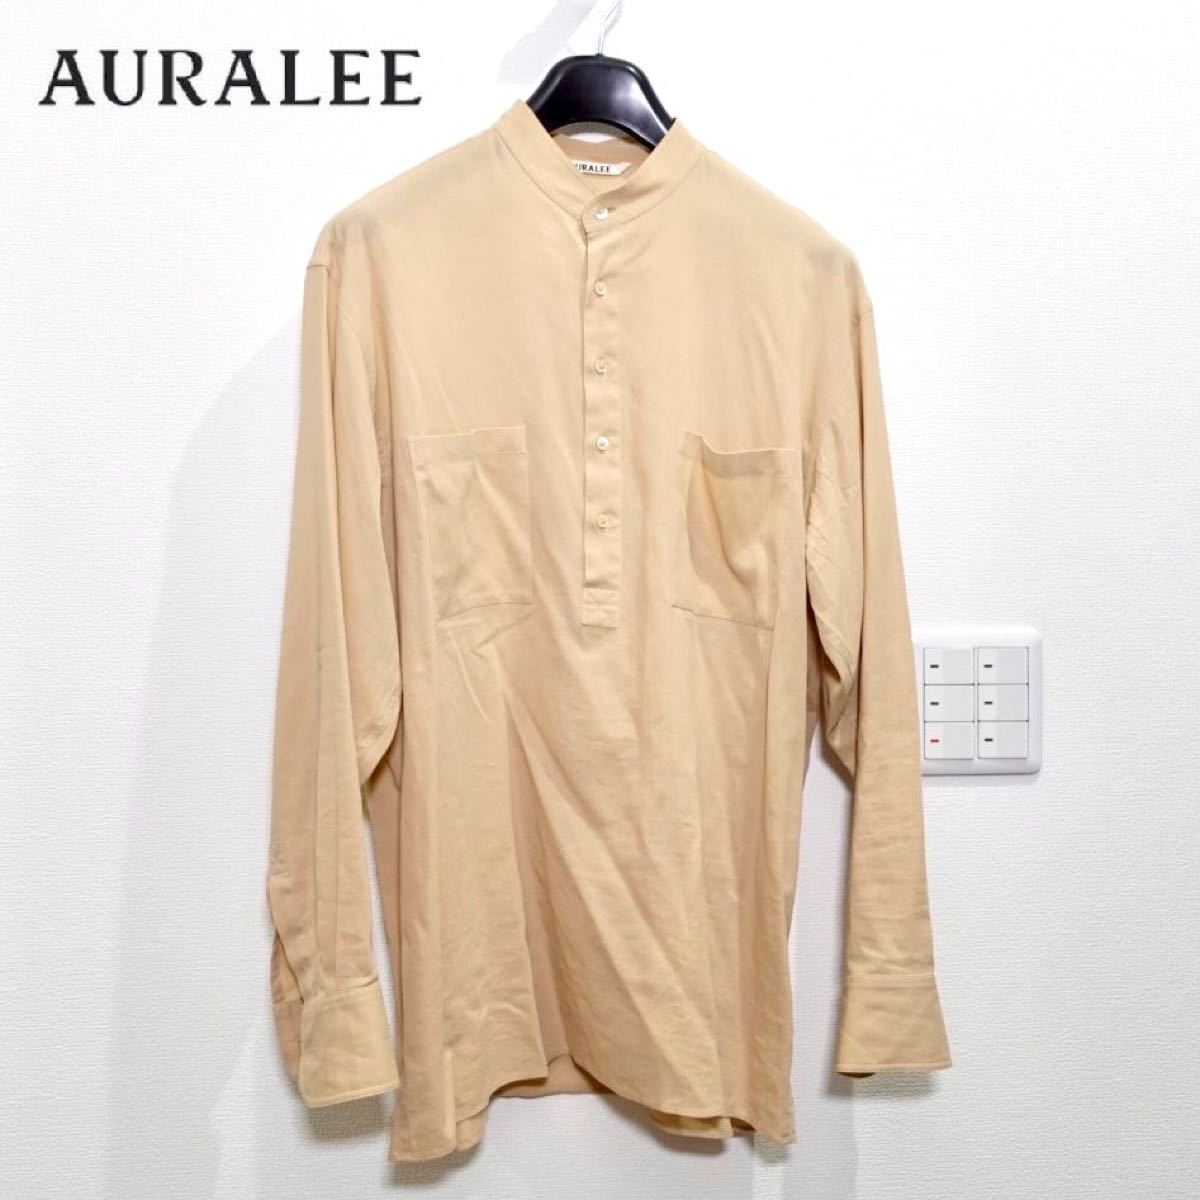 AURALEE オーラリー ノーカラー シャツ ナチュラル メンズ 3